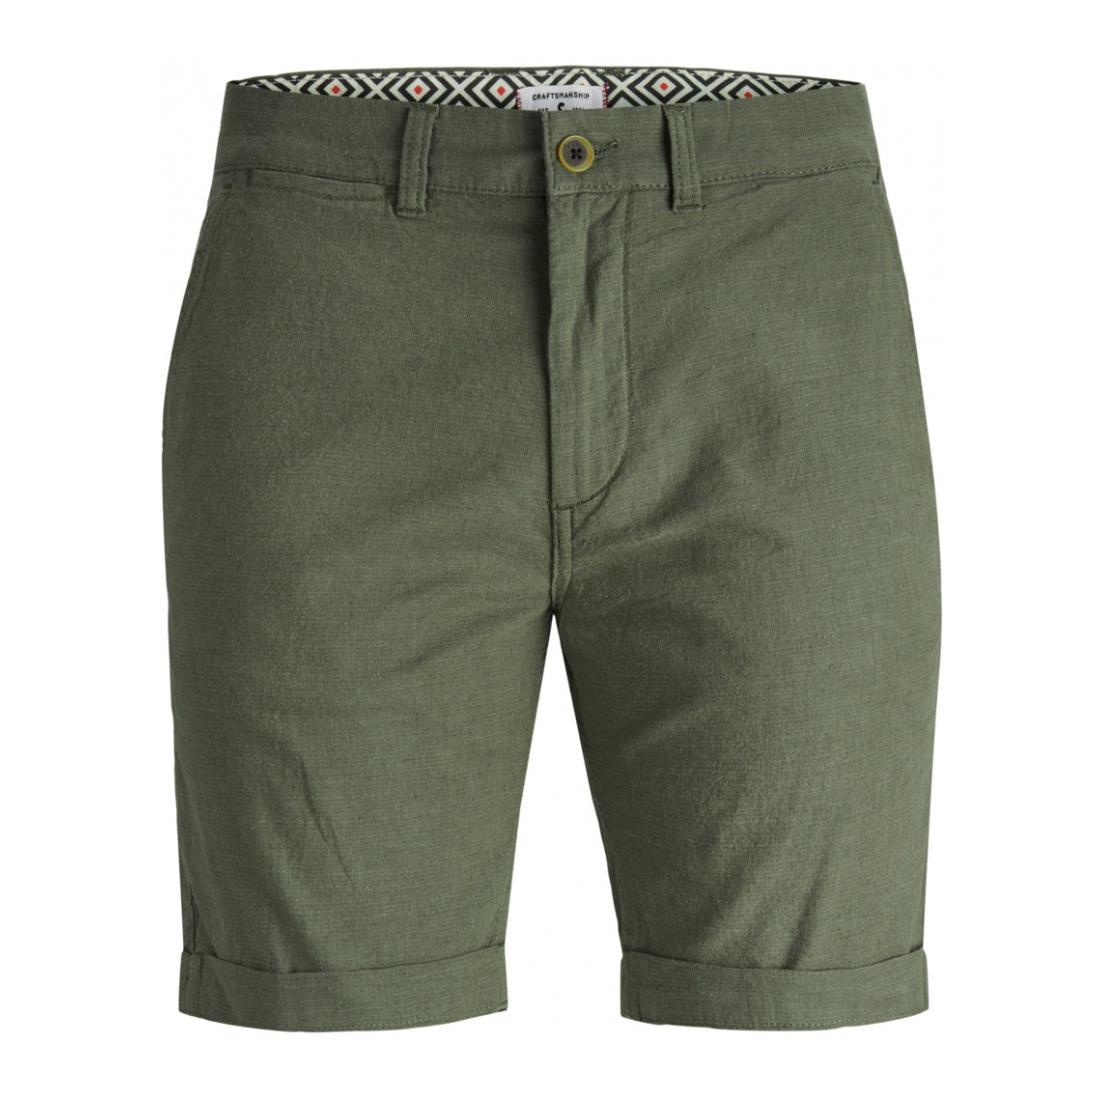 Jack & Jones Bermuda/Shorts Herren JJILINEN JJCHINO SHORTS A